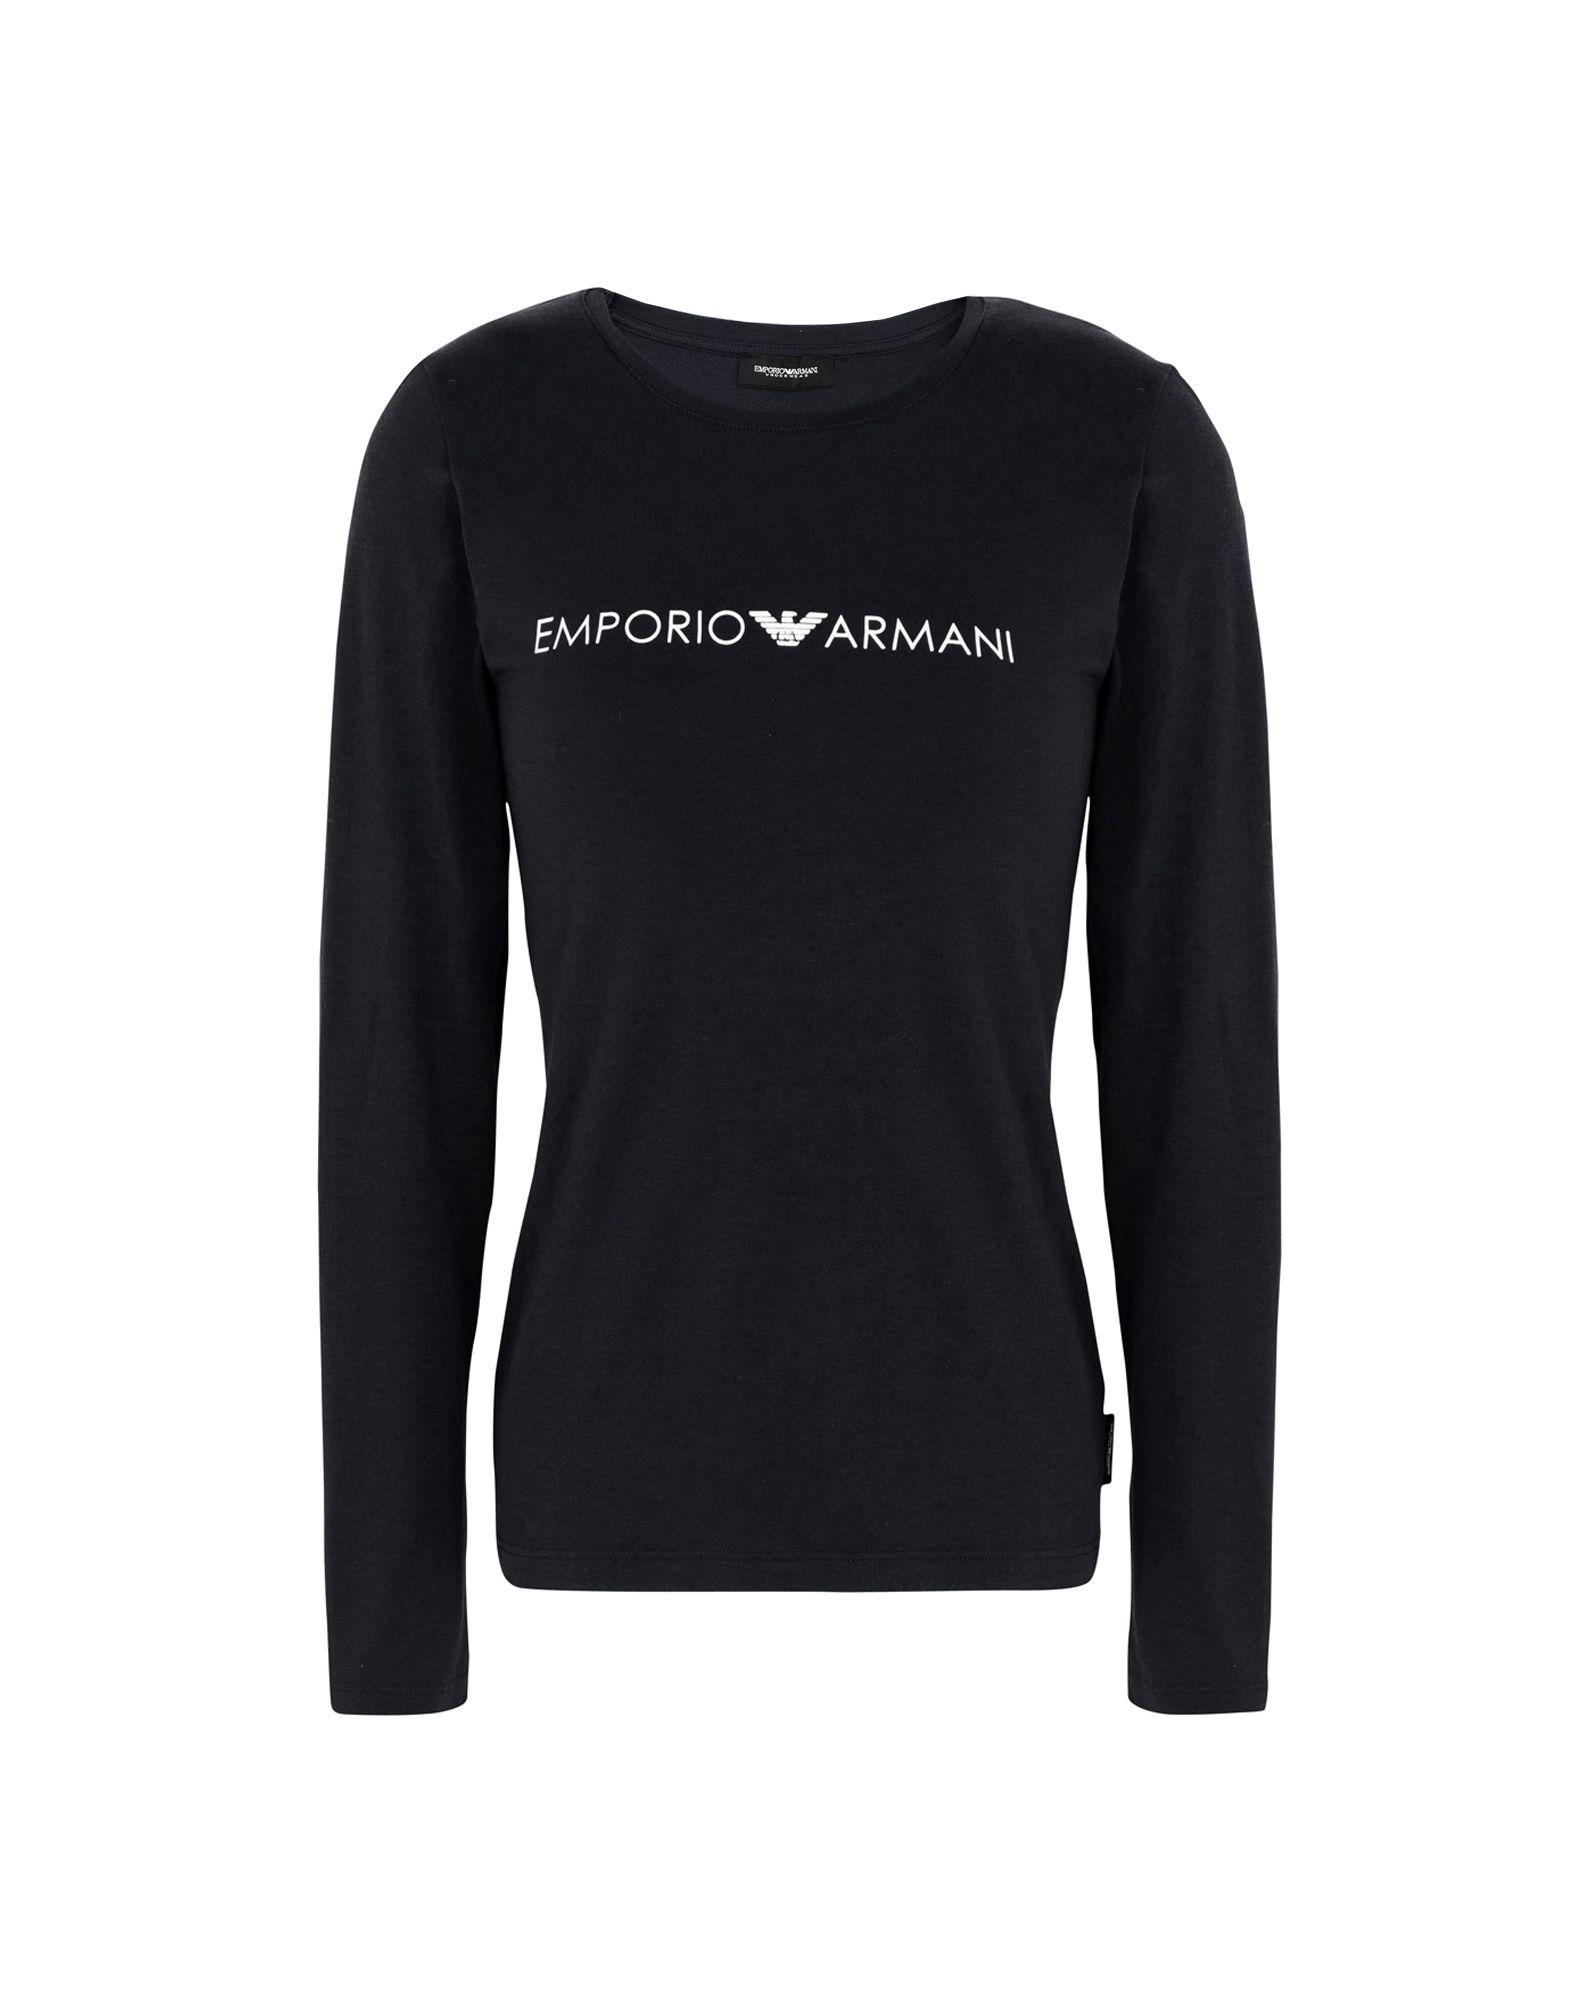 EMPORIO ARMANI Футболка футболка мужская emporio armani 3